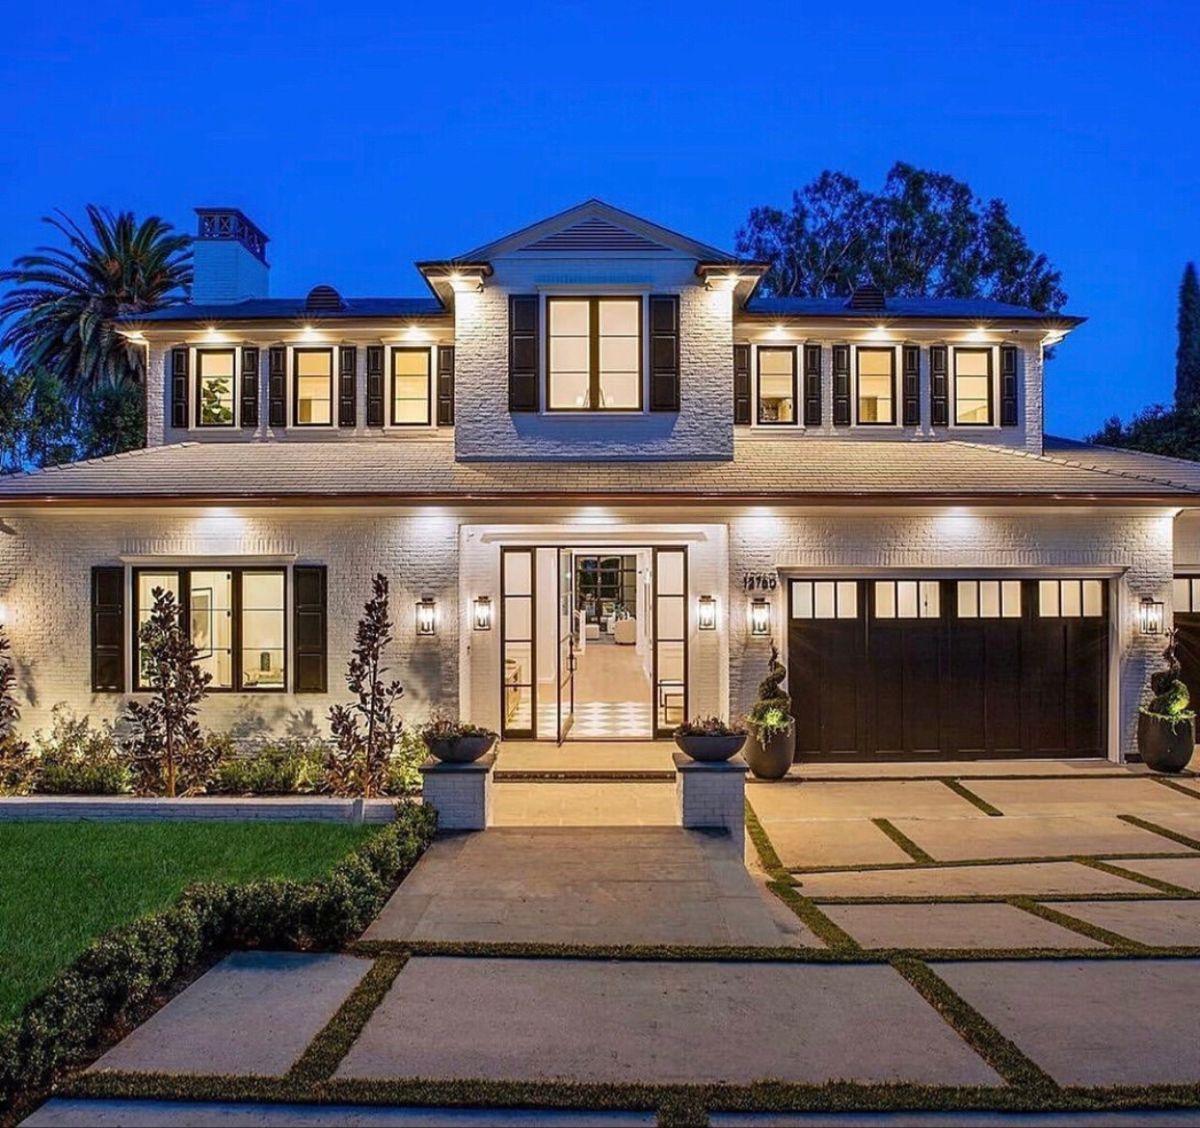 #dreamhouses #villa #dreamhouseideas #dreamhouseplans